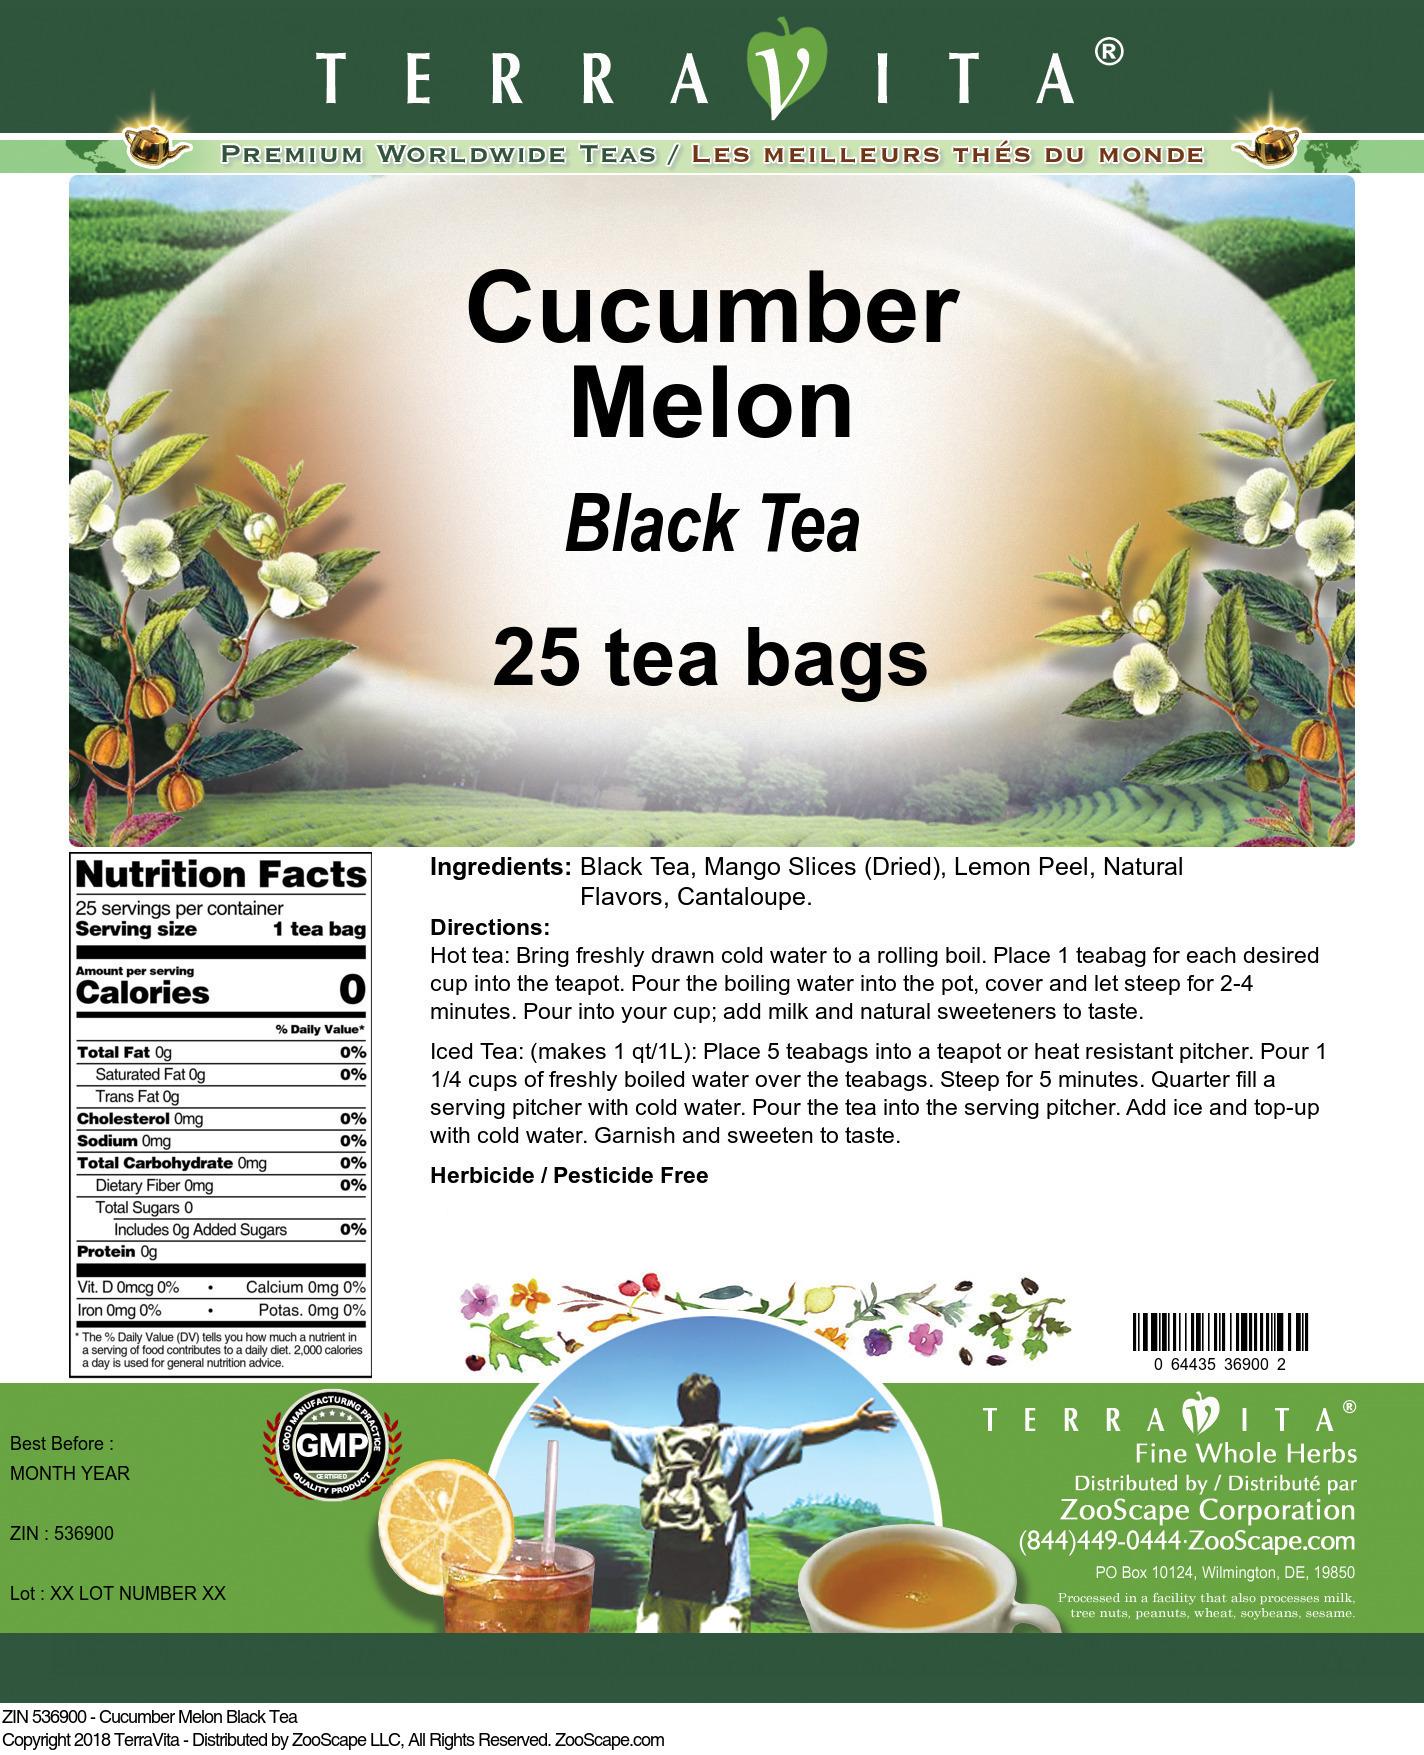 Cucumber Melon Black Tea